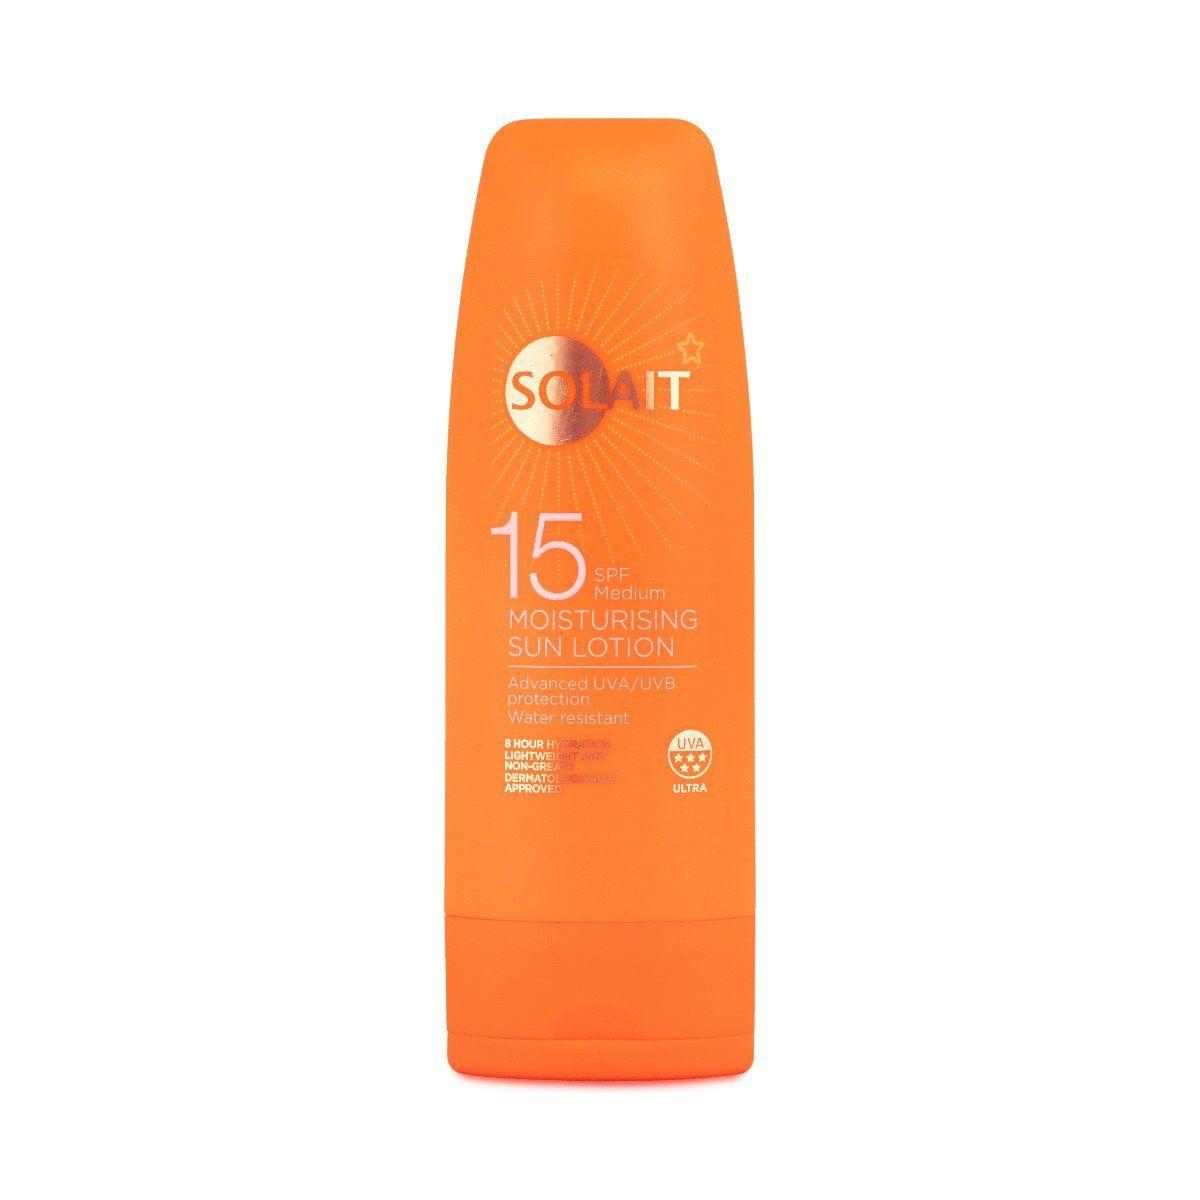 Solait Sunscreen